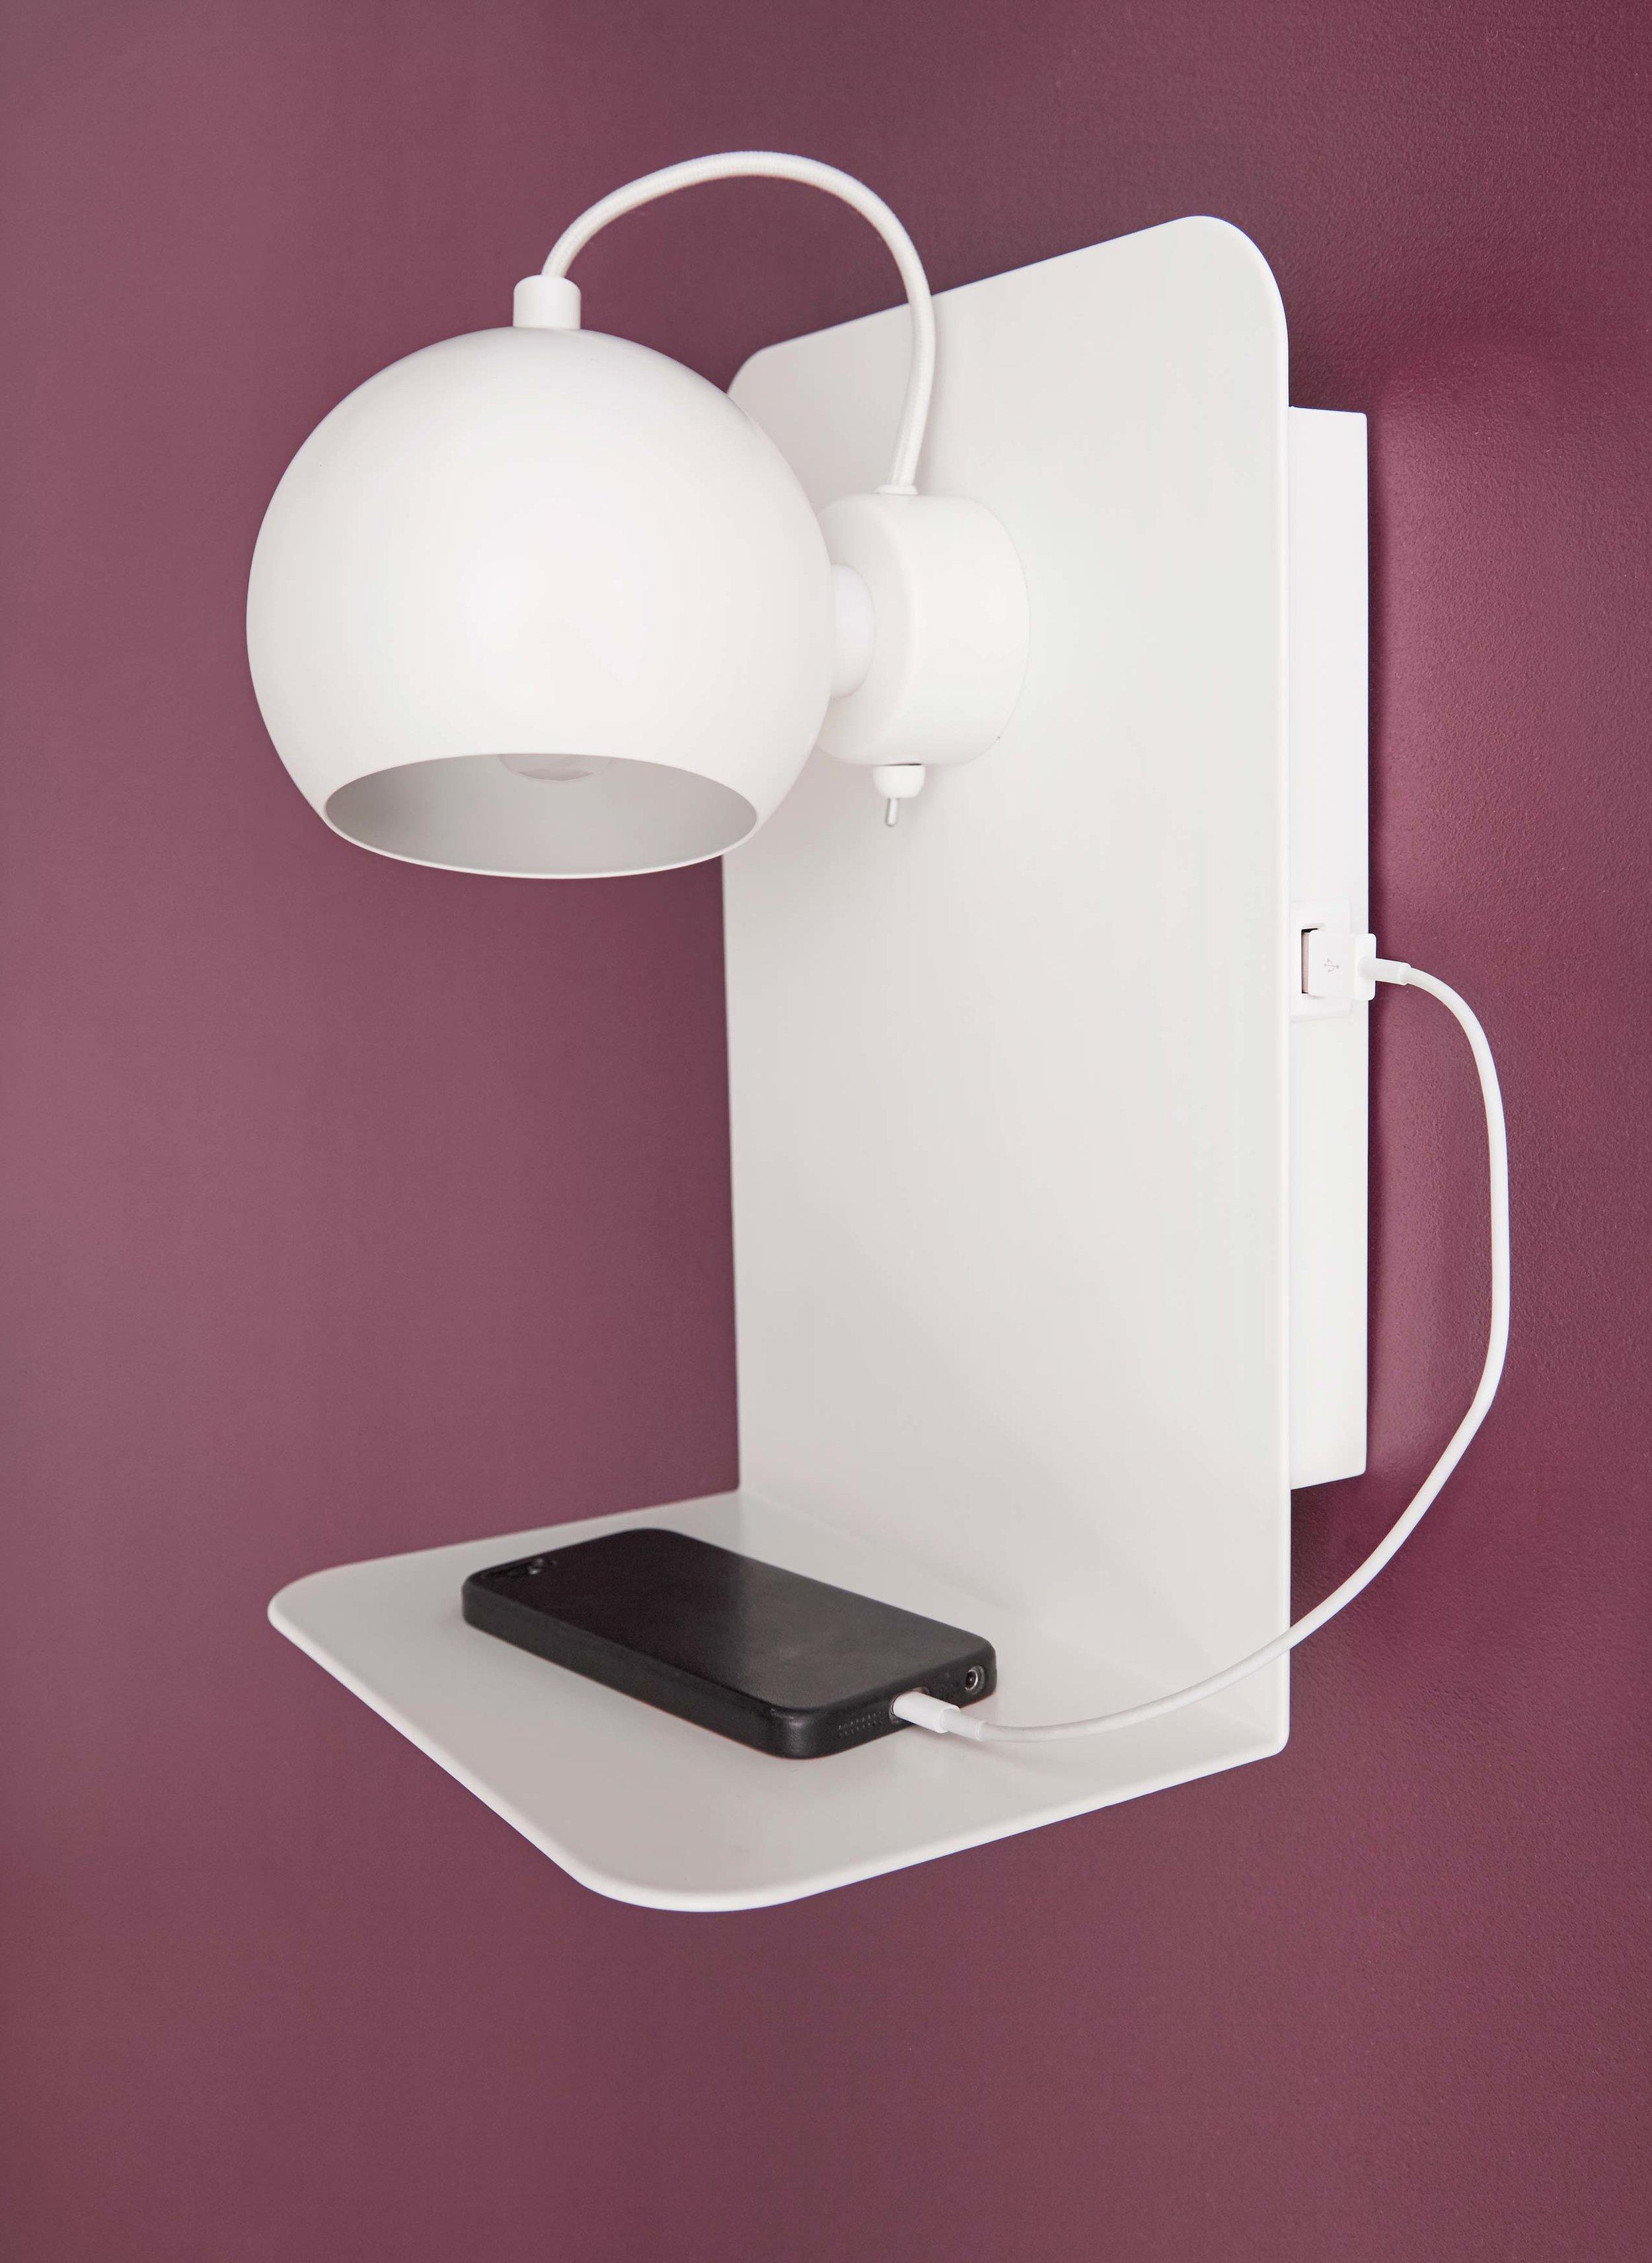 Ball-USB-wall-lamp-white-matt---lifestyle-Studio-Horsens-4016.jpg